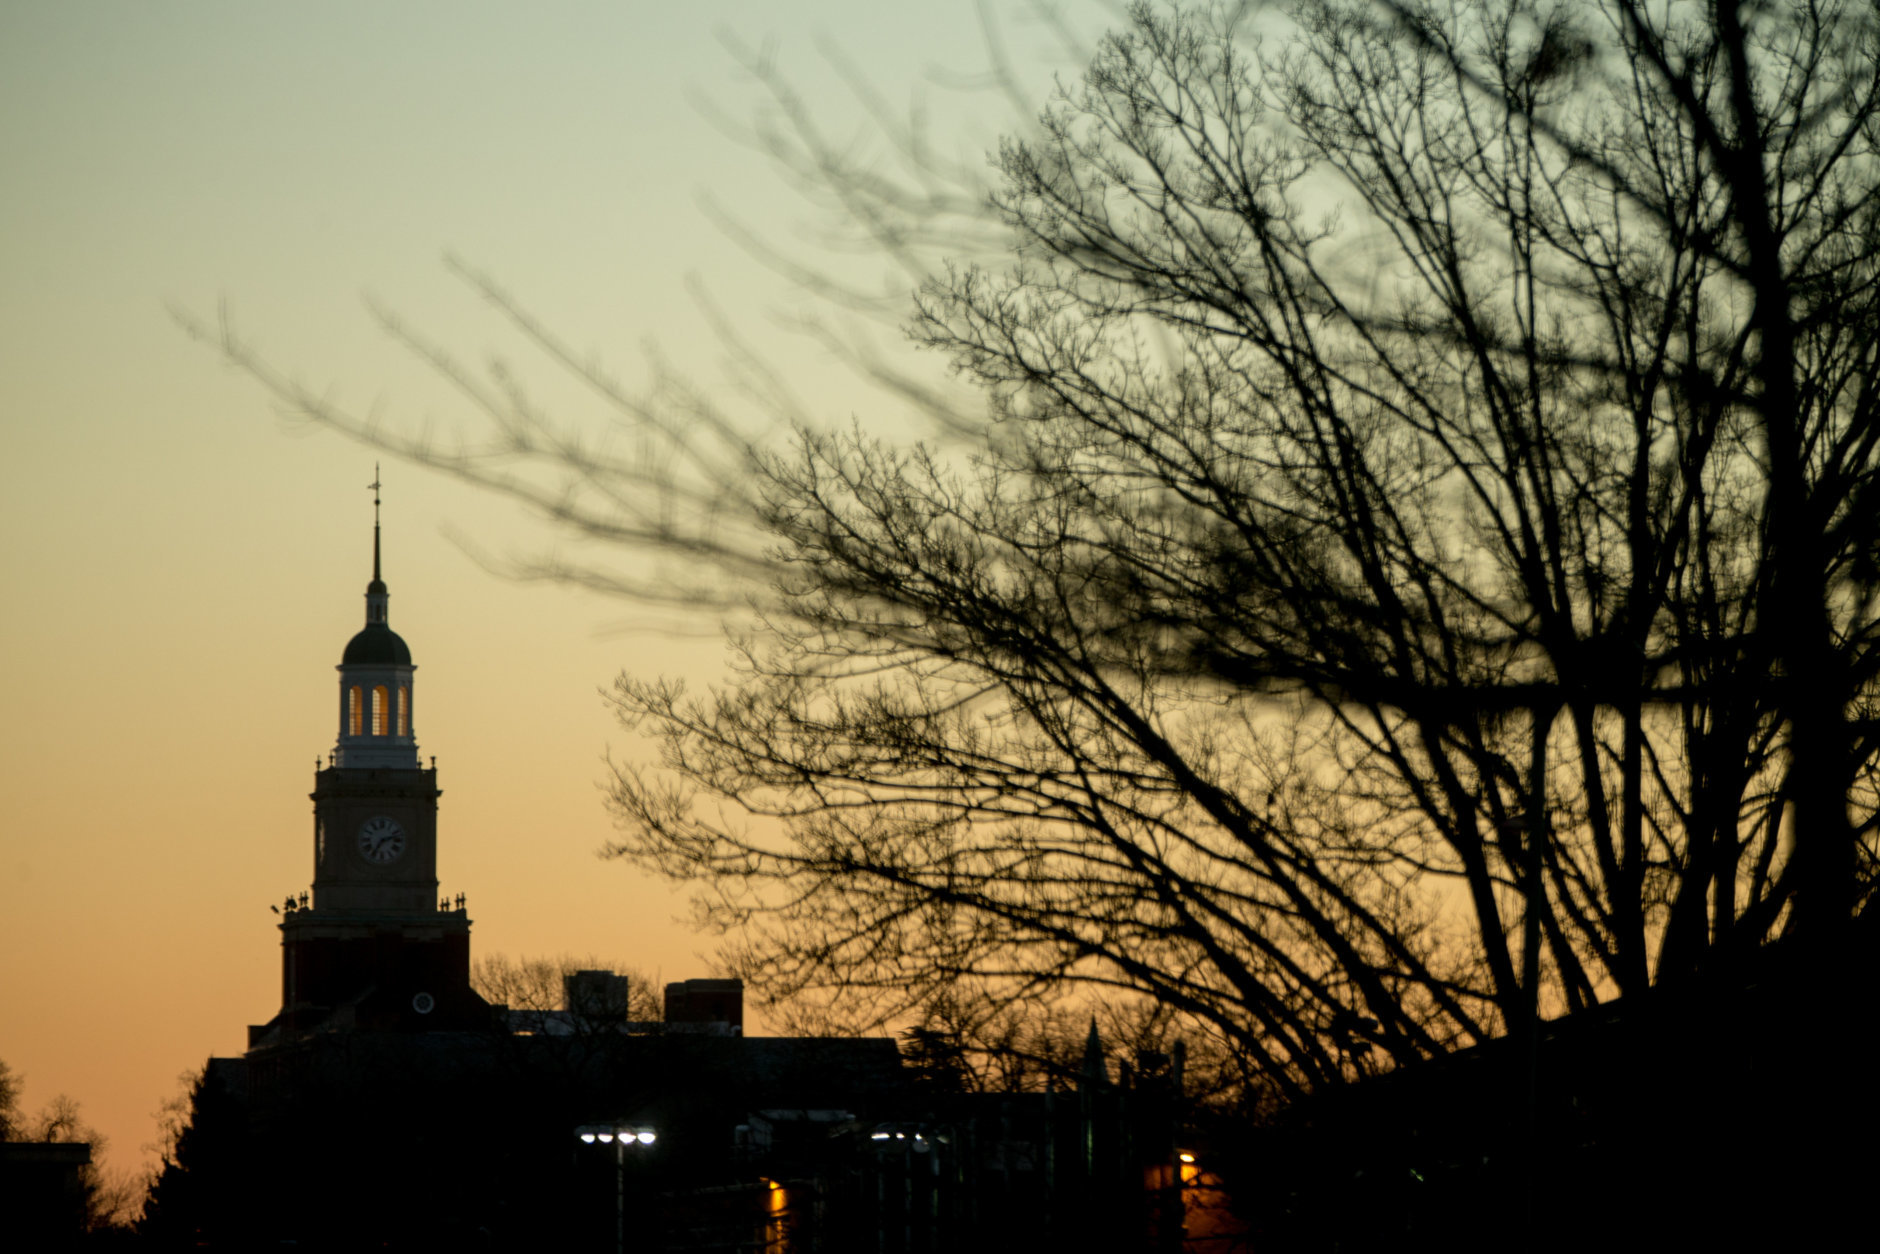 FILE -- The Howard University Campus at sunrise in Washington, Saturday, Dec. 19, 2015. (AP Photo/Andrew Harnik)